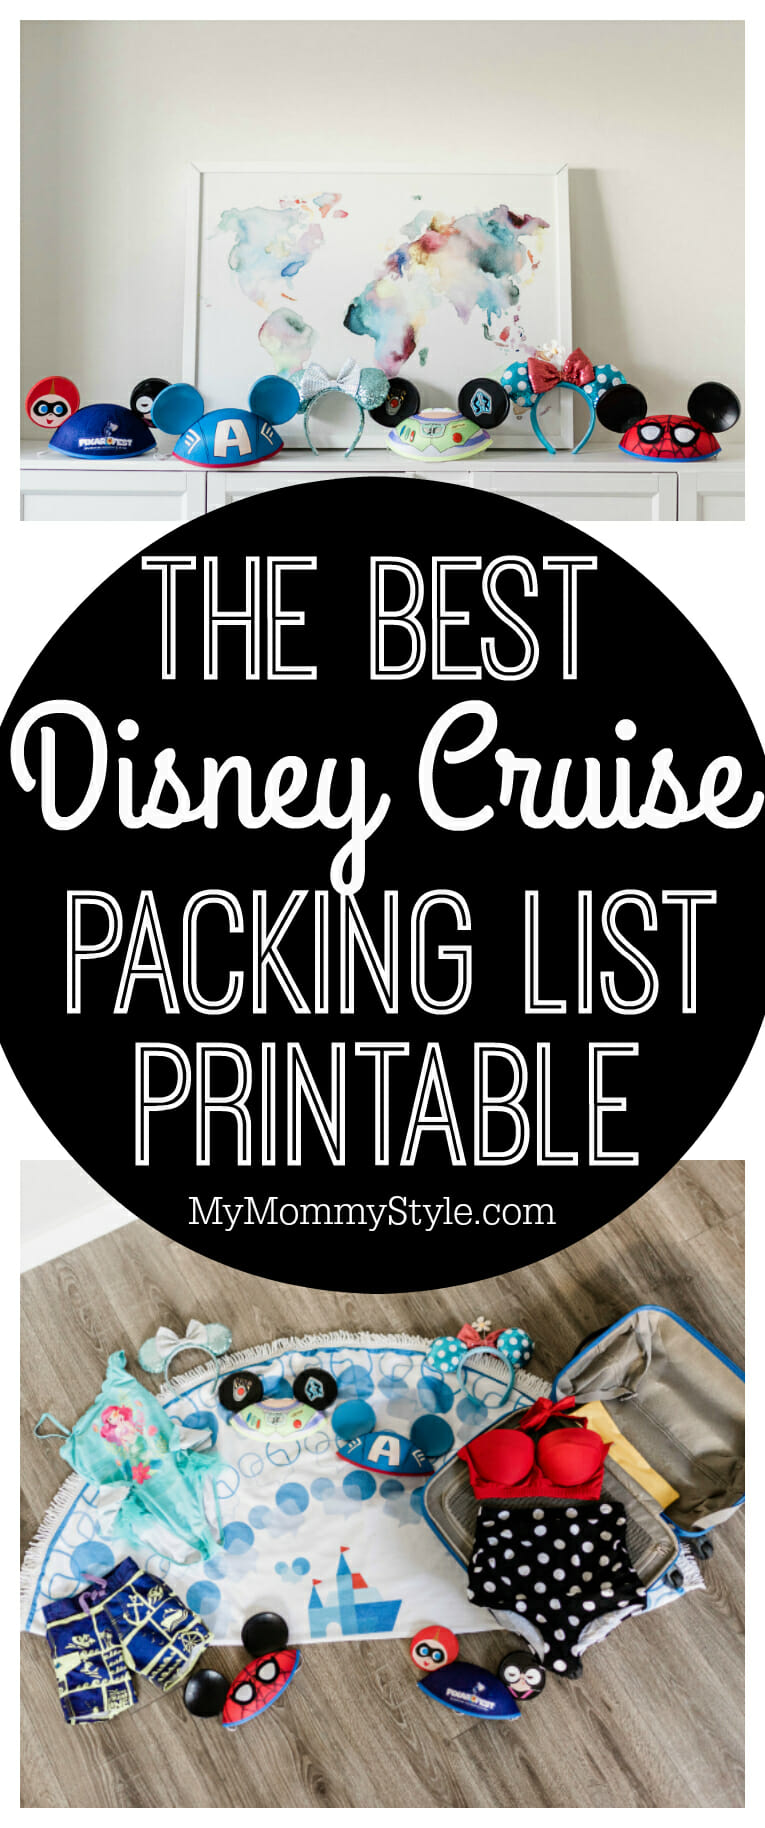 Disney Cruise, disney packing list, cruise Disney packing list